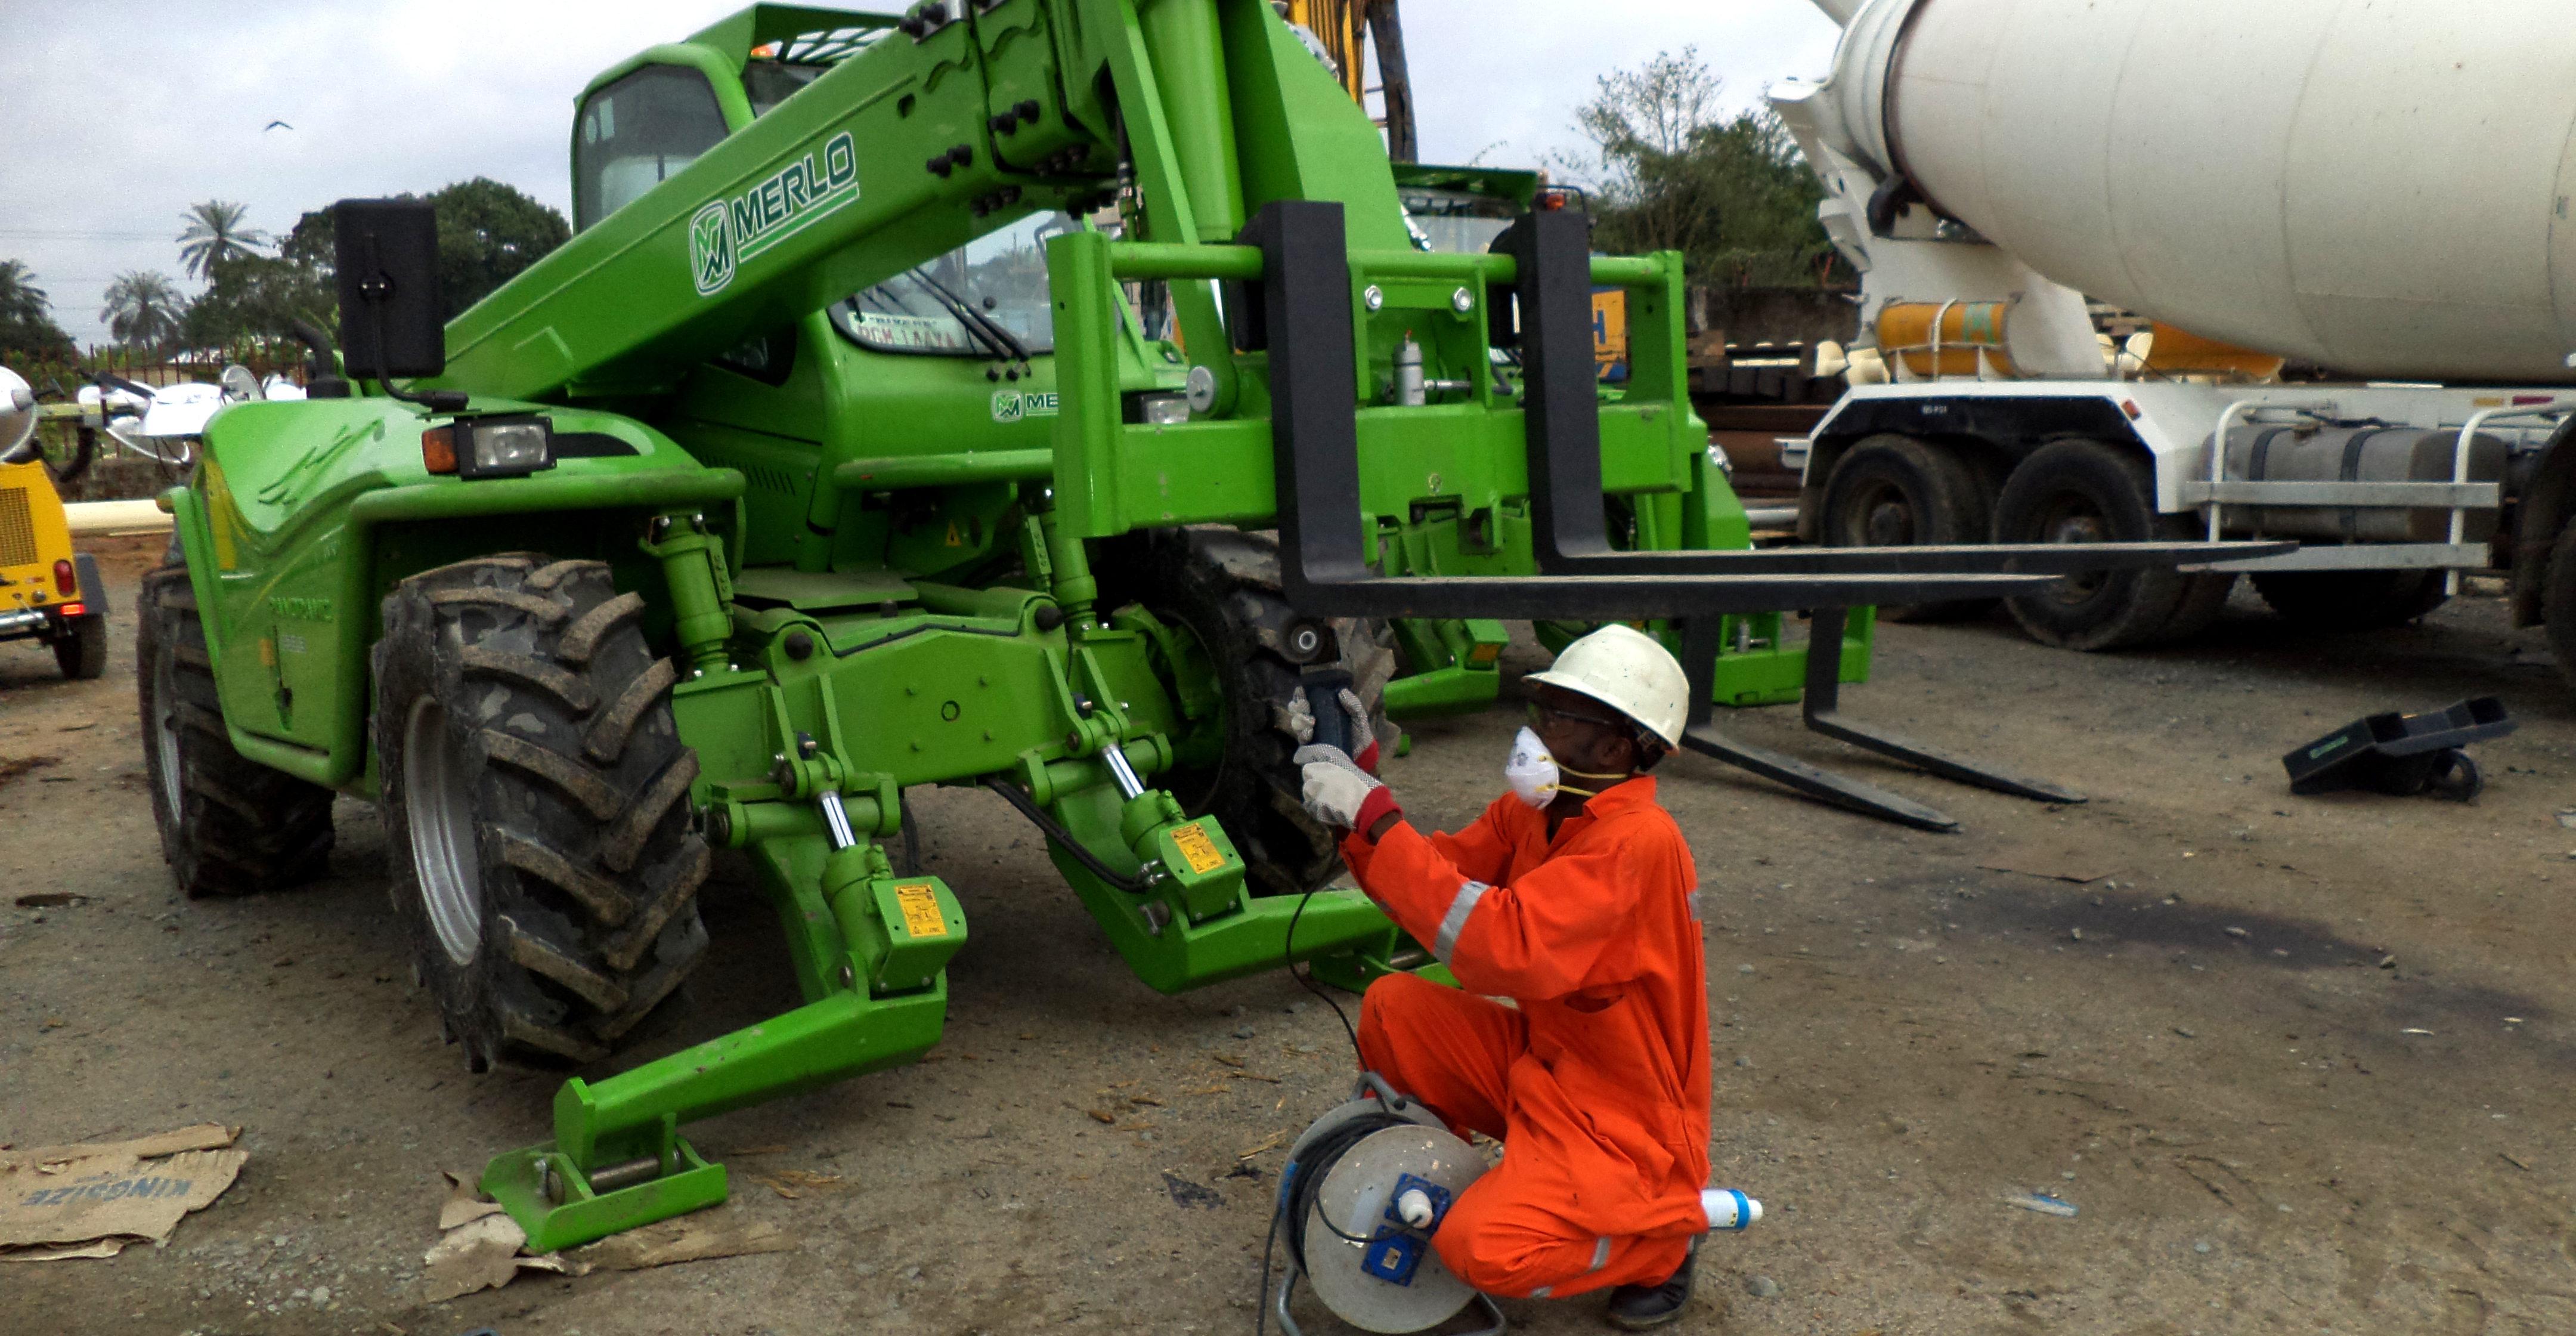 Detagulf inspector inspecting a telehandler (variable reach truck) for D.I.L